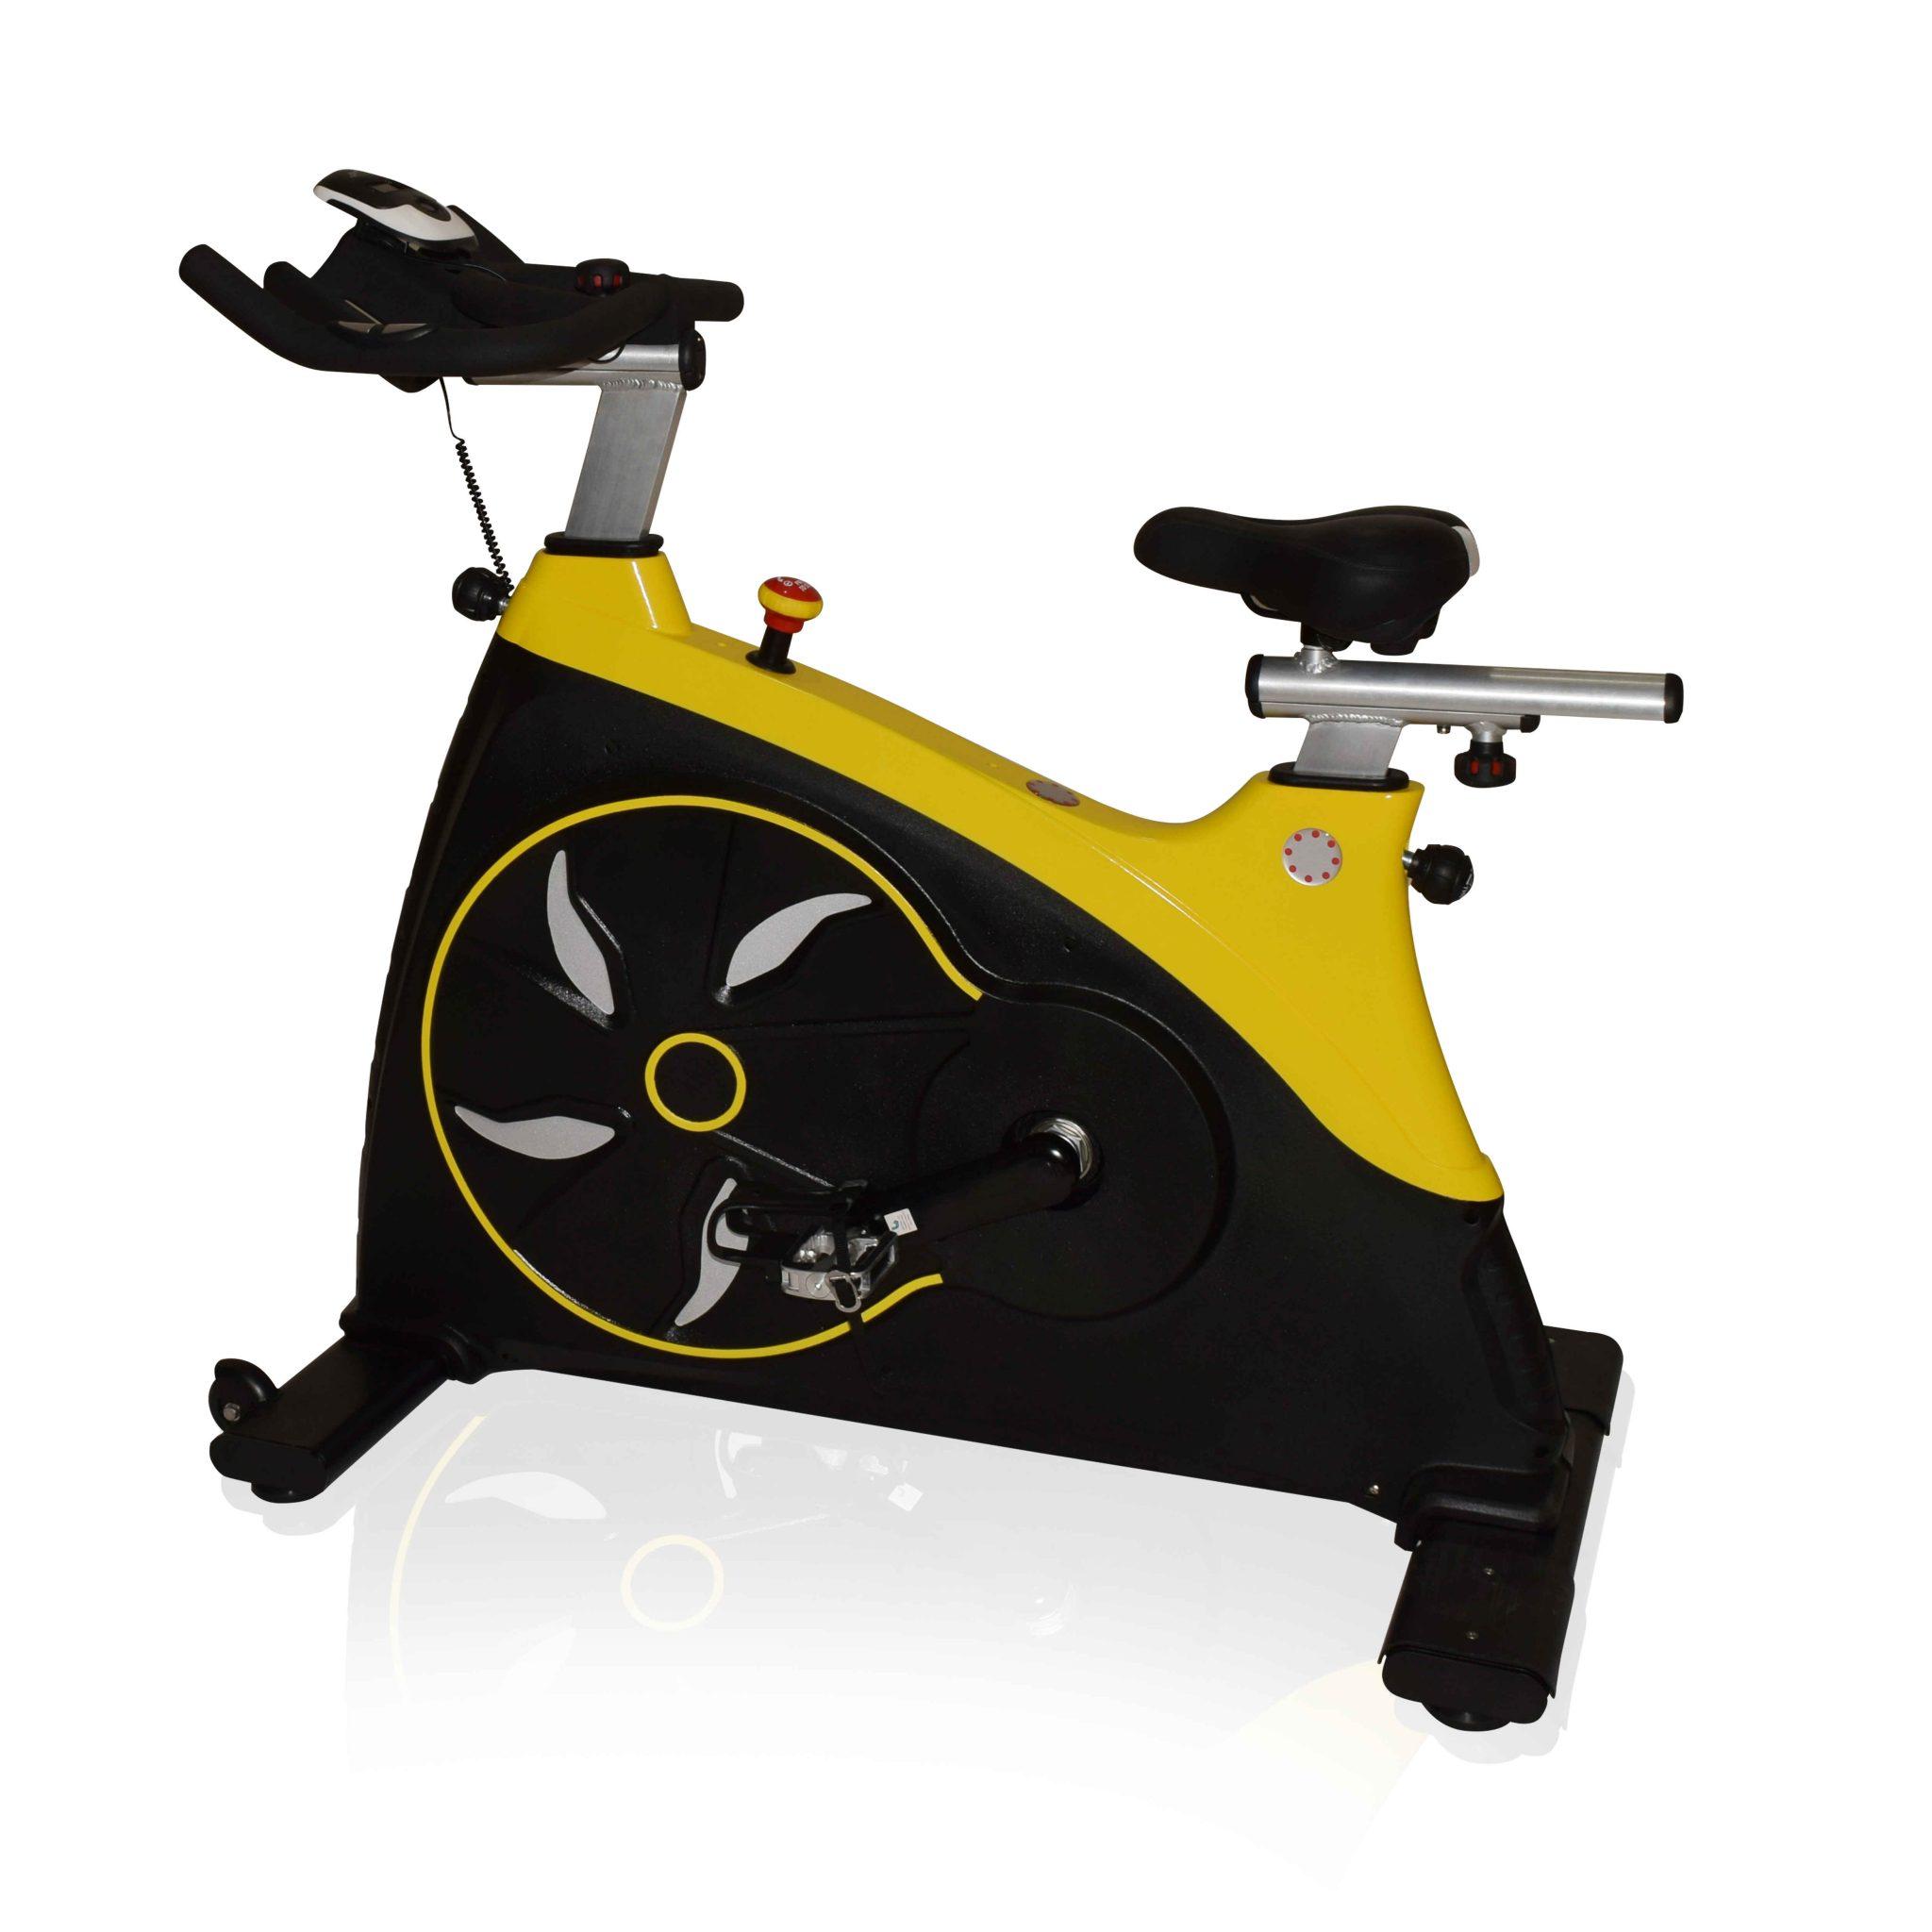 OB-2201 Spinning Bike Commercial Use